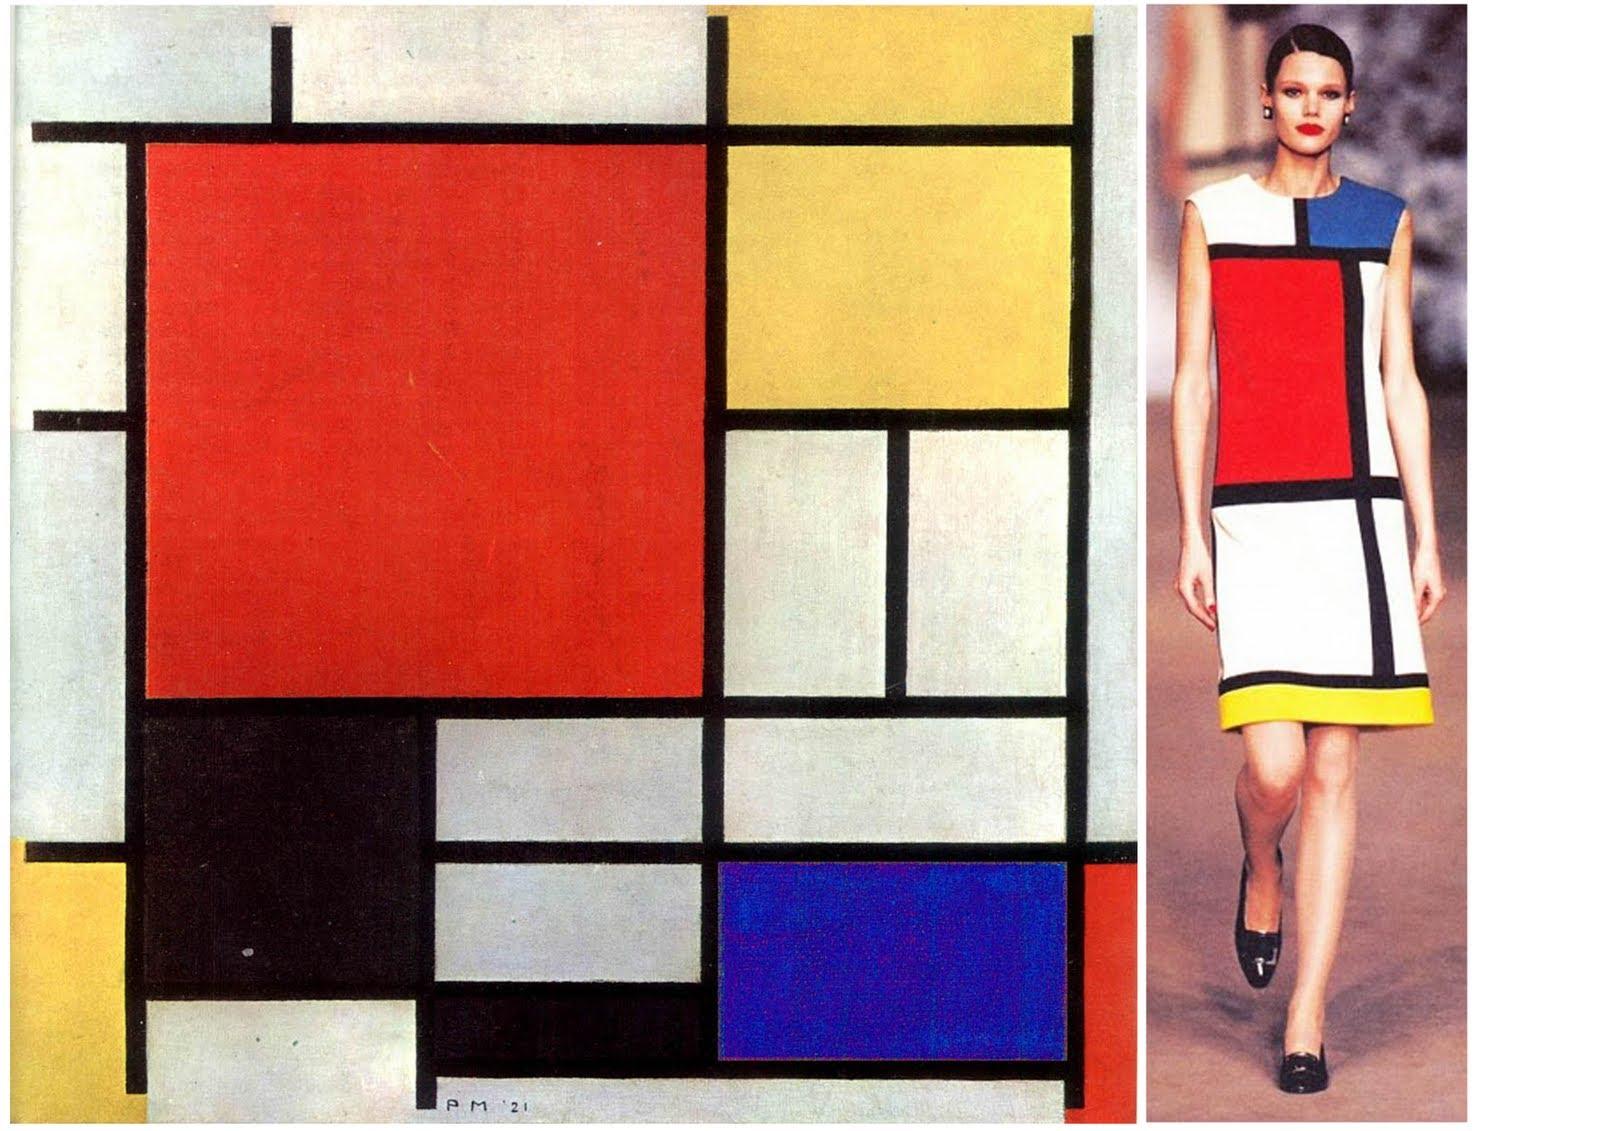 Коллекция Yves Saint Laurent 1965 года по картинам Пита Мондриана